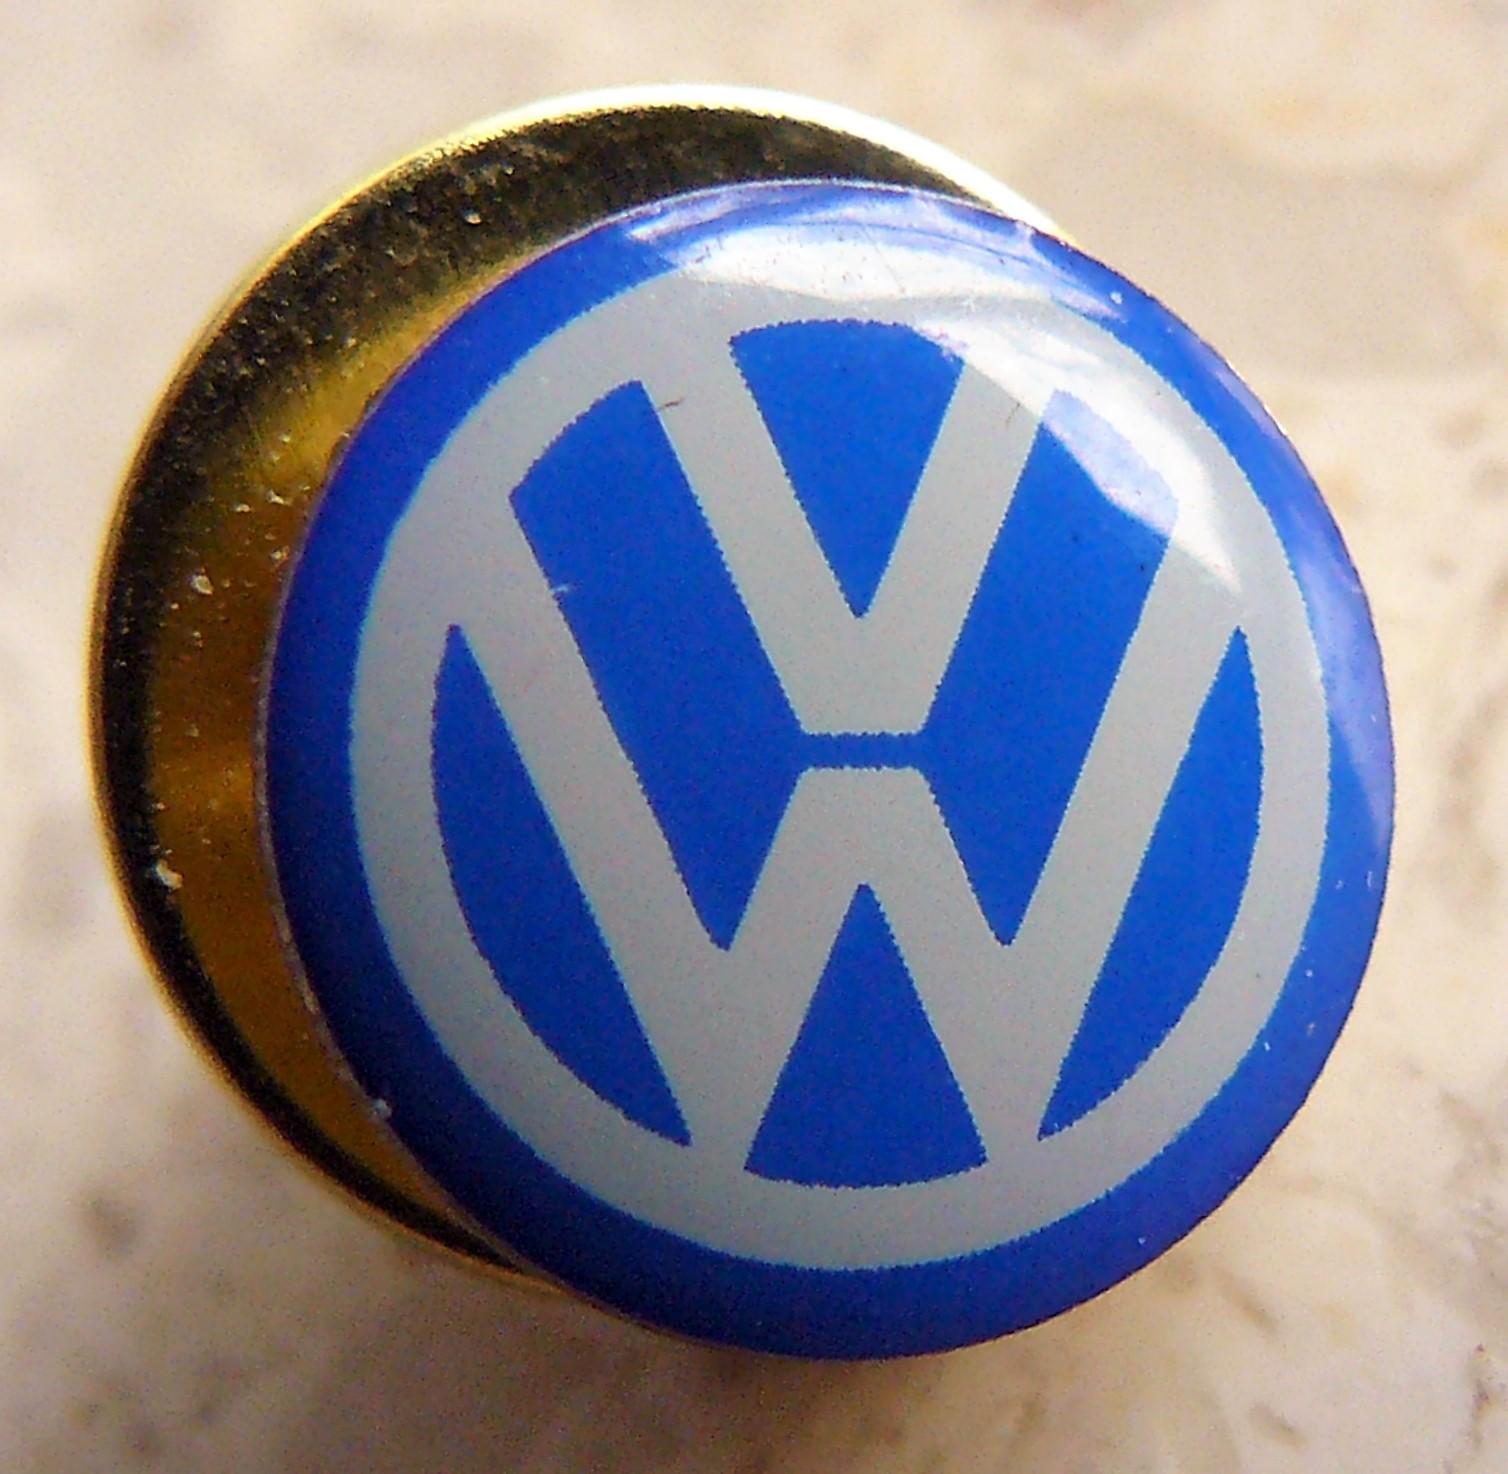 Speldjes Porsche Pin Badge Motorsport silber logo geschwungene Form